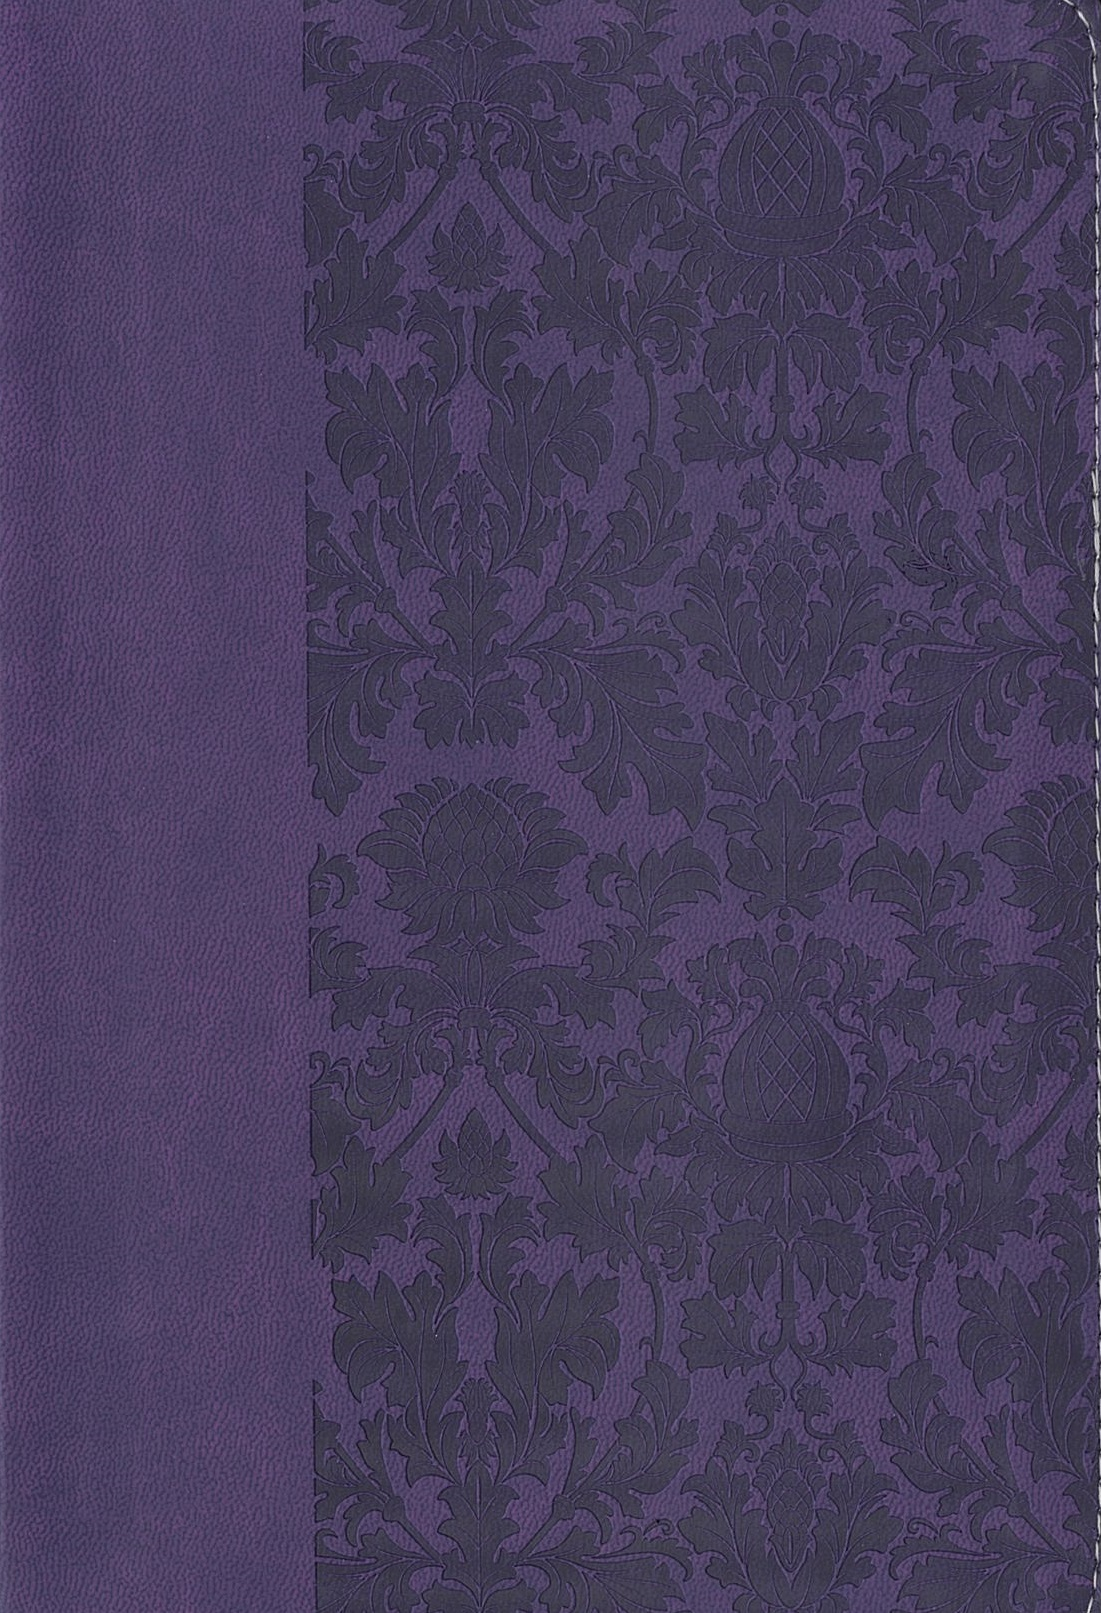 Biblia KJV/Letra Grande/Morado/Ingles